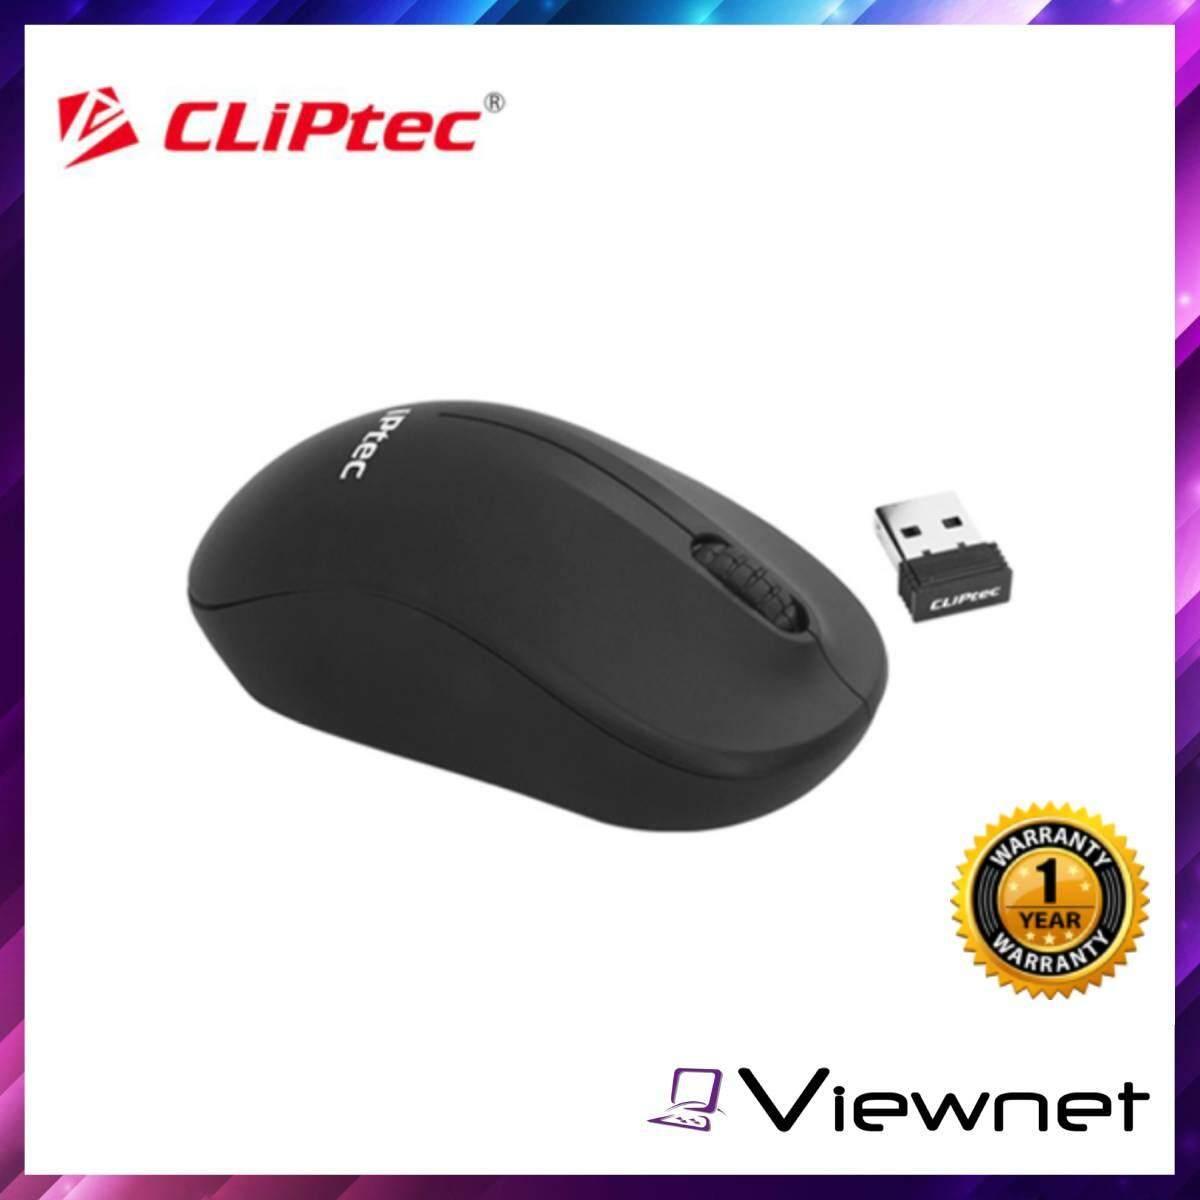 Cliptec wireless (RZS-853) Sparkle 2.4GHz Optical Mouse, 1200dpi, High Precision Optical, USB 2.0/1.1